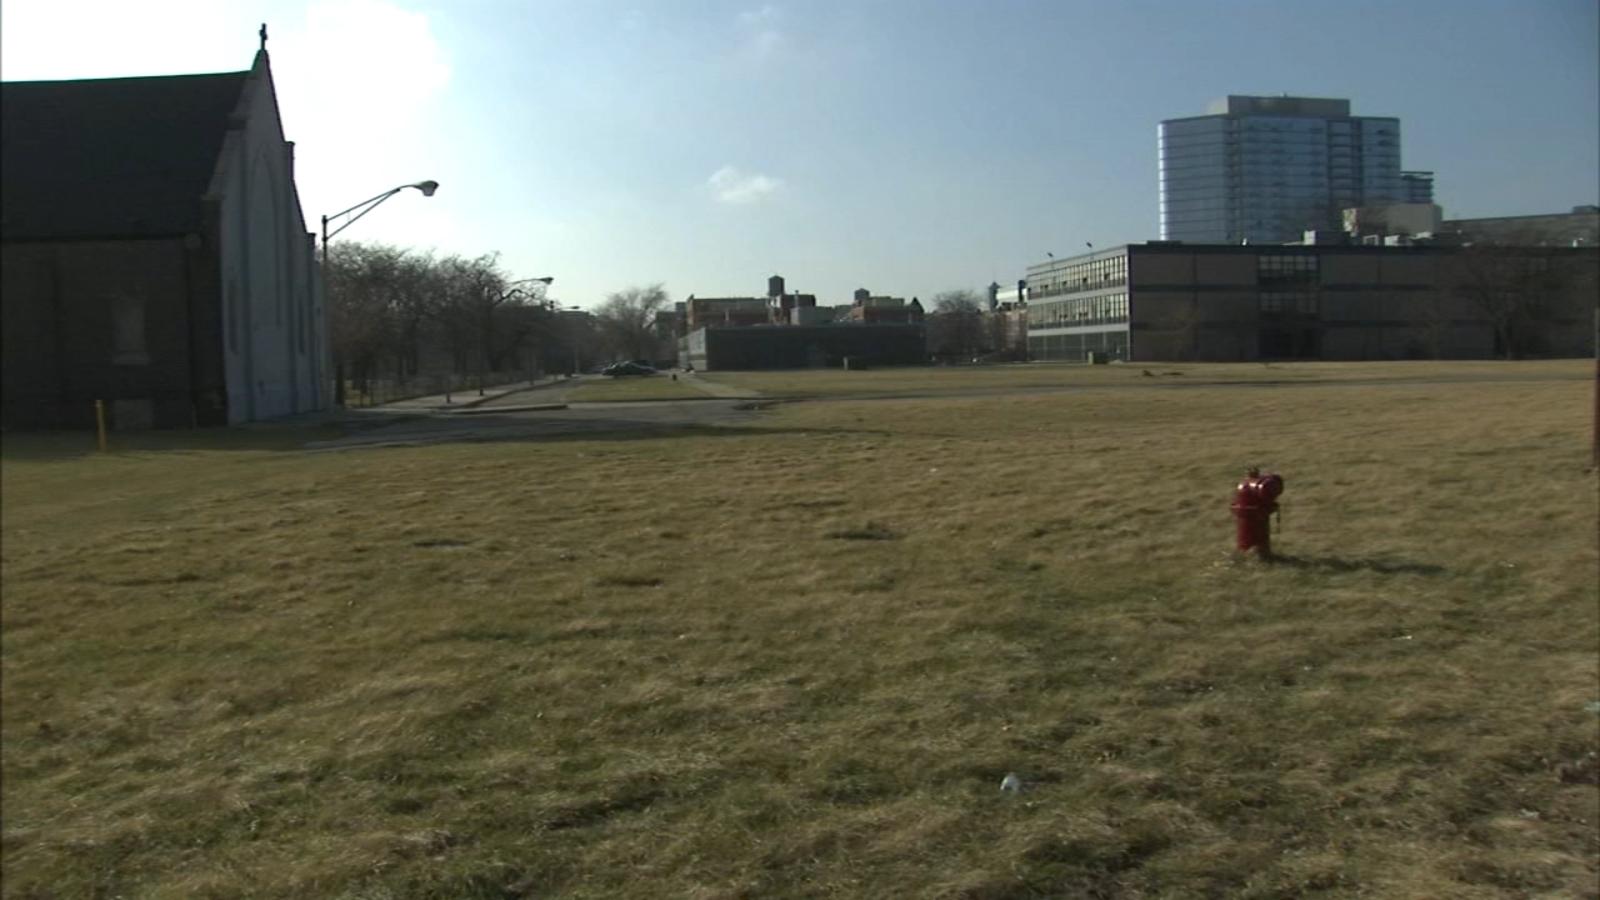 Mayor Lightfoot looking to extend Cabrini-Green TIF, BGA says